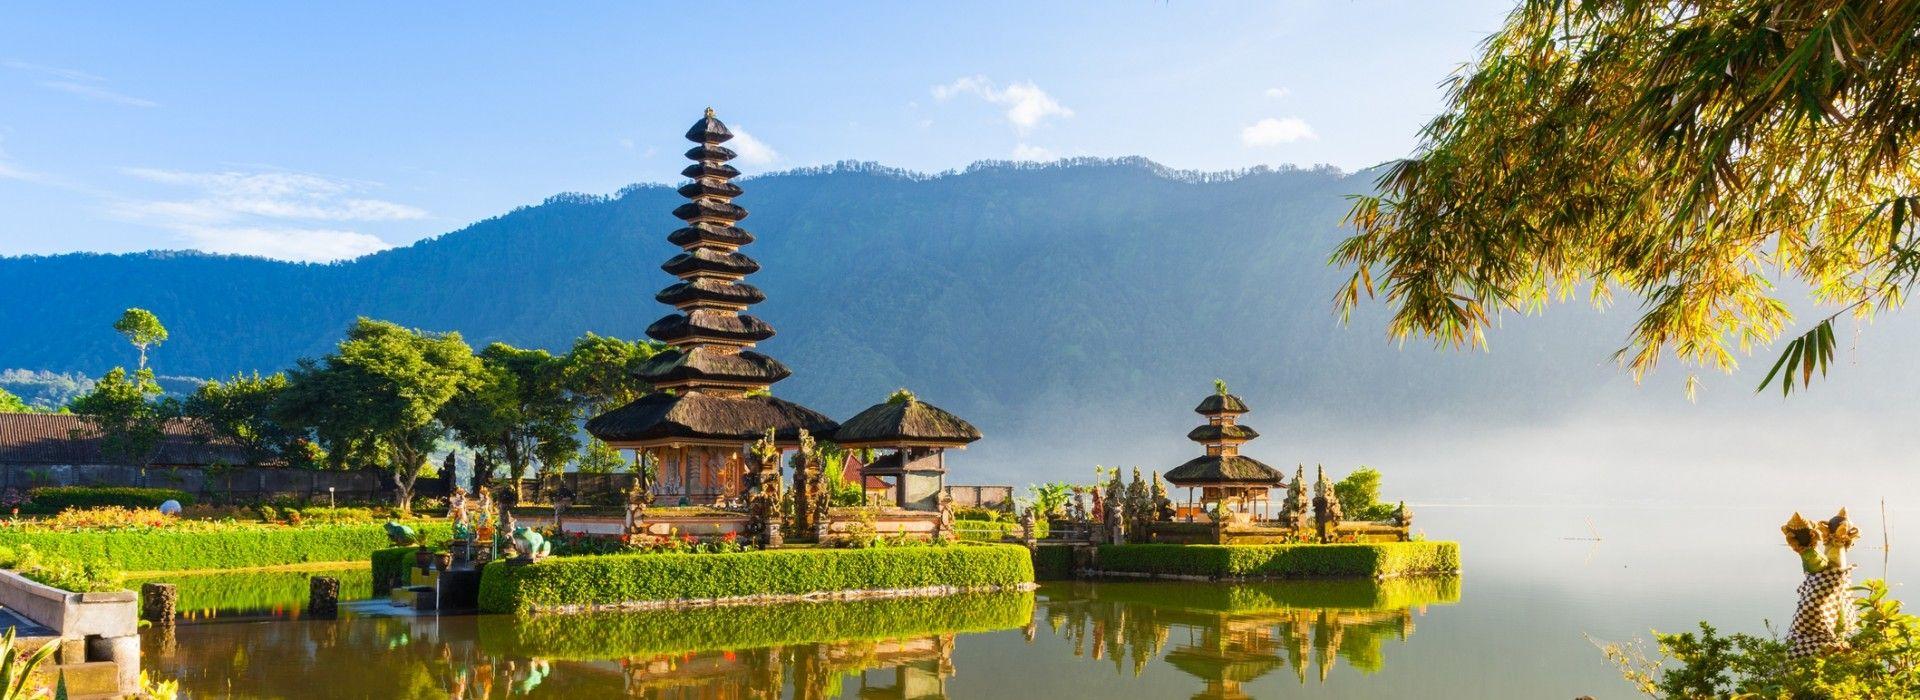 Wildlife Tours in Bali